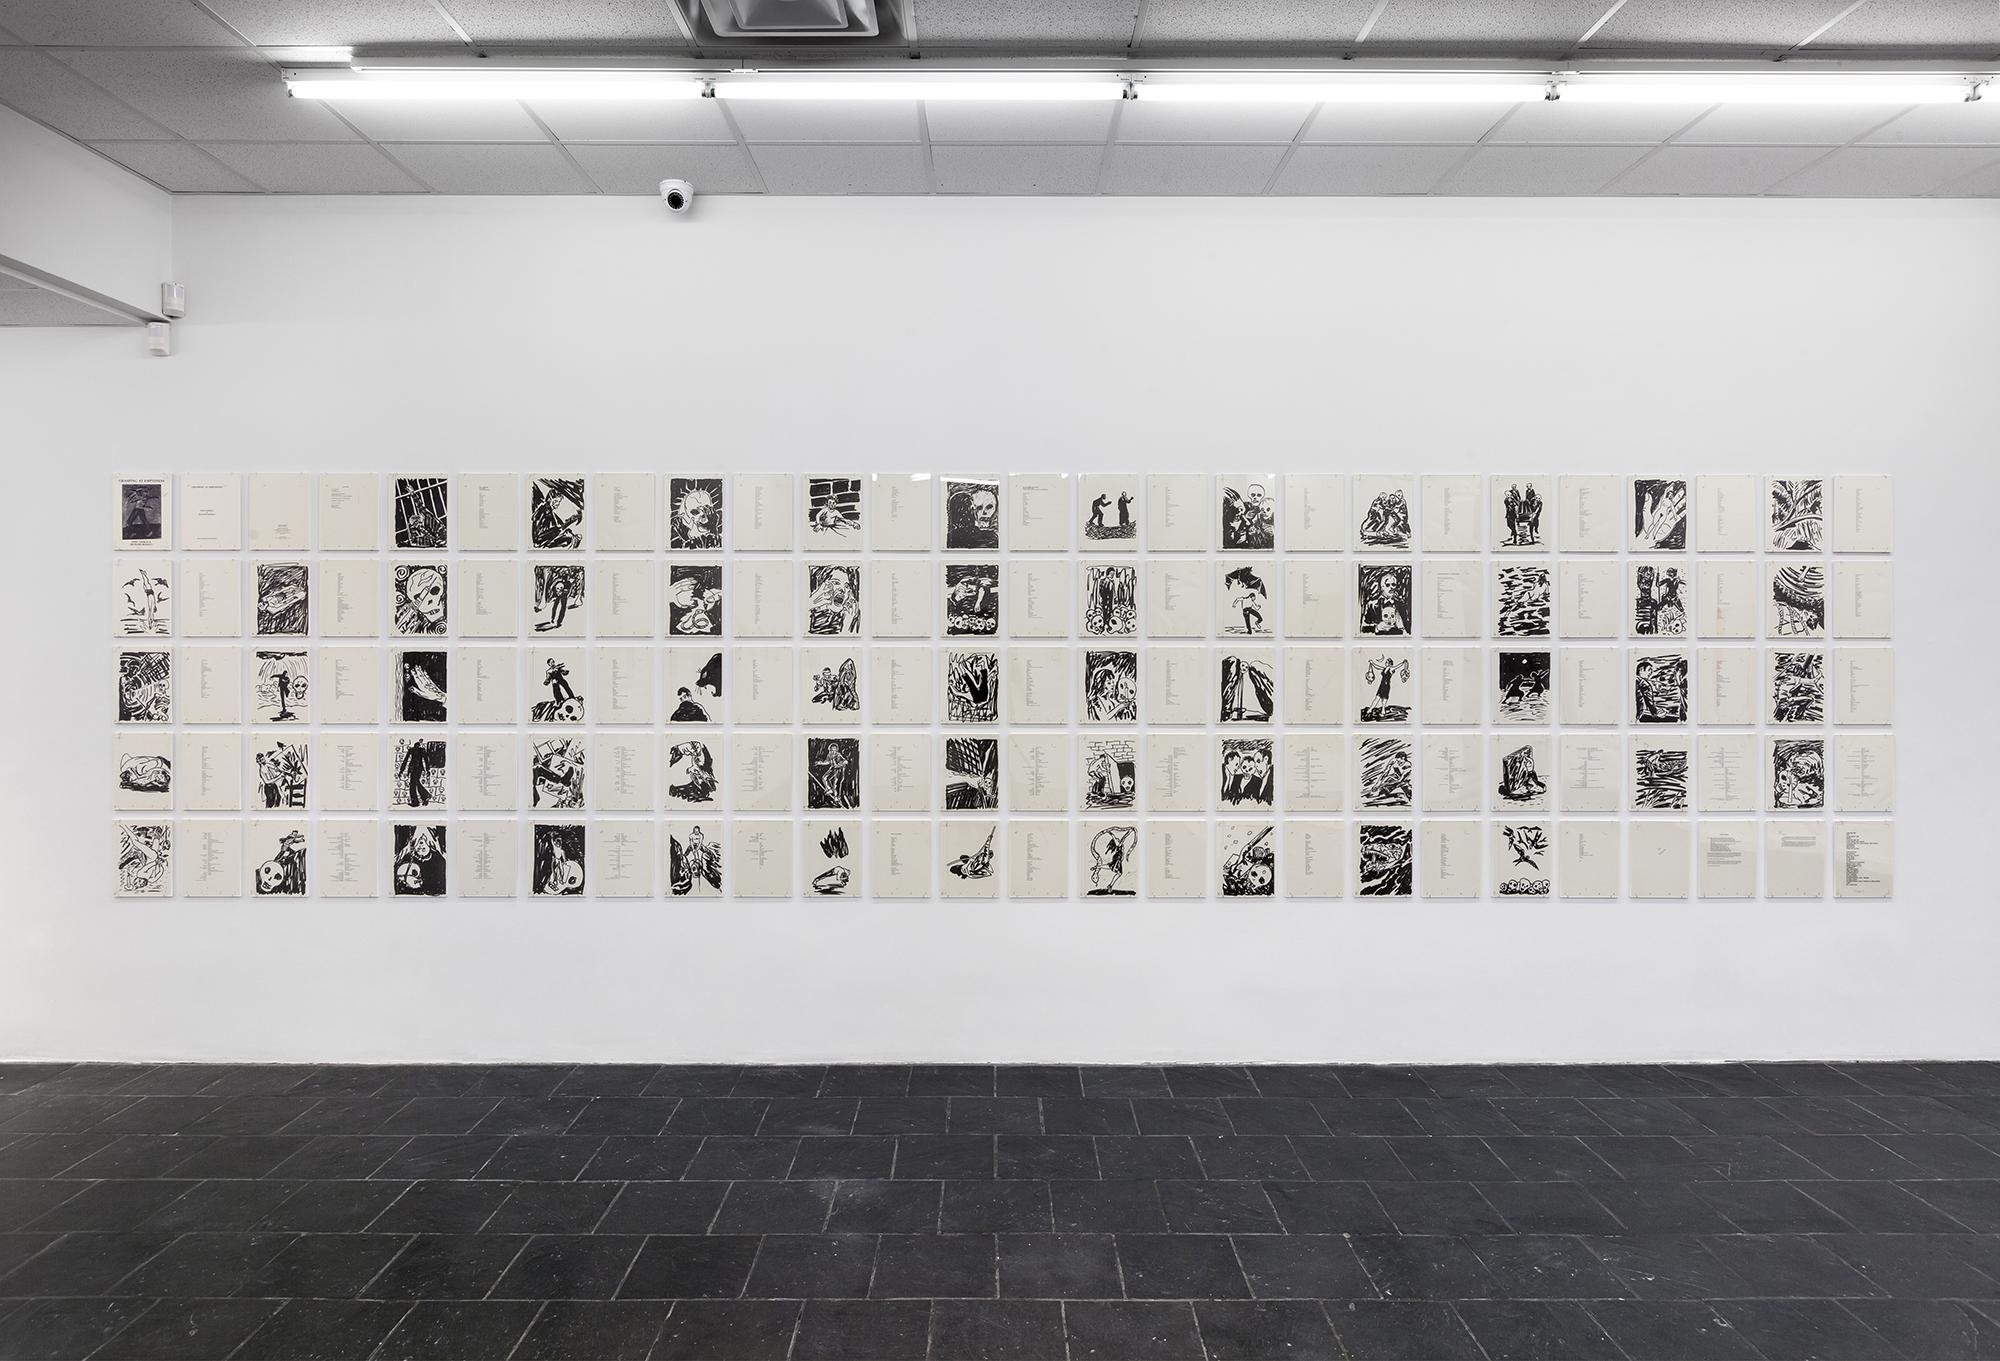 Installation view of Richard Bosman's Grasping at Emptiness (1985) © Richard Bosman, Photo Credit: Daniel Pérez